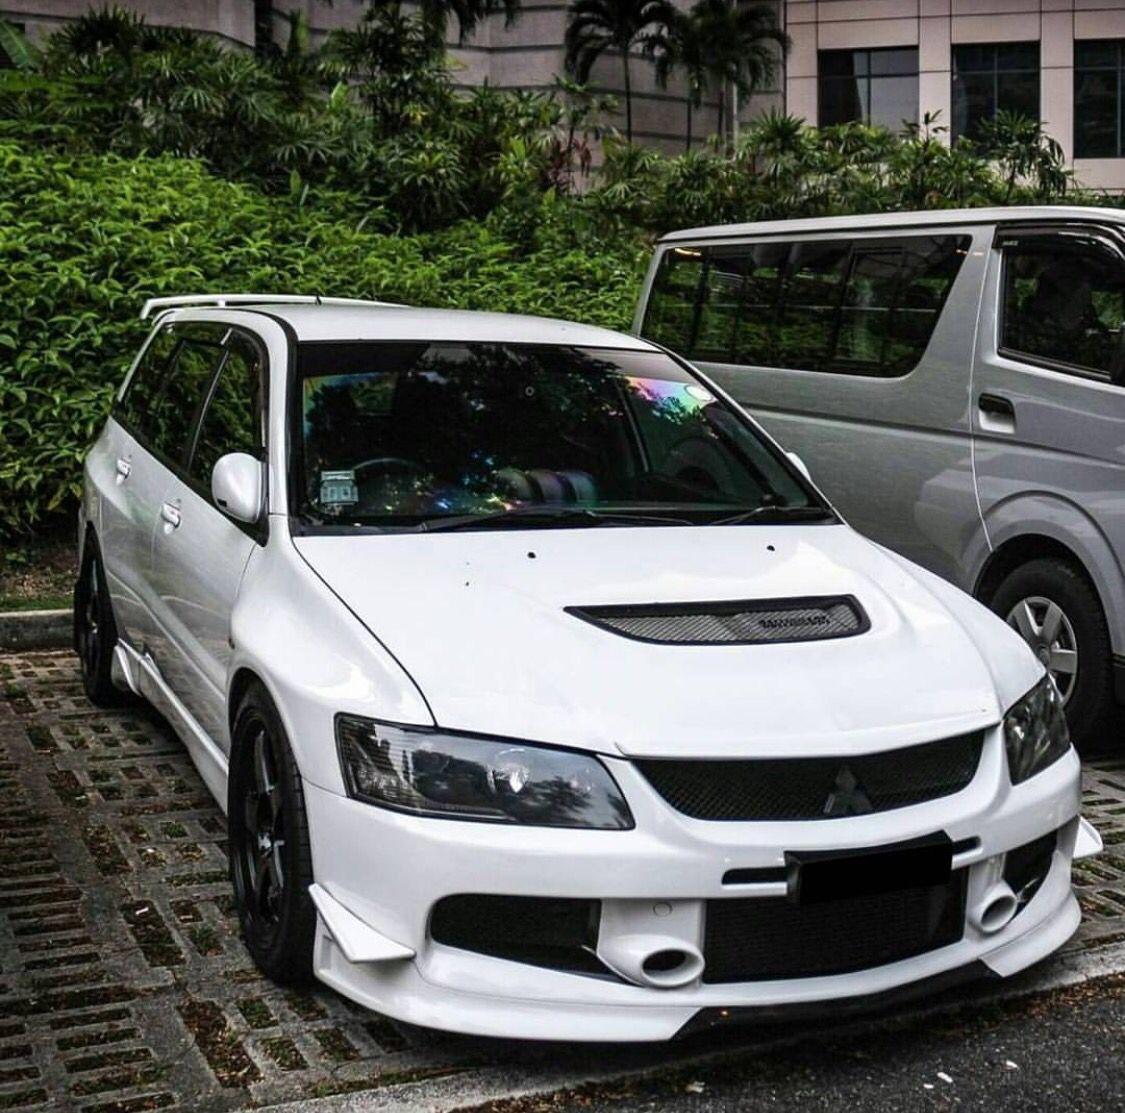 Mitsubishi Evo: Mitsubishi Lancer, Mitsubishi Lancer